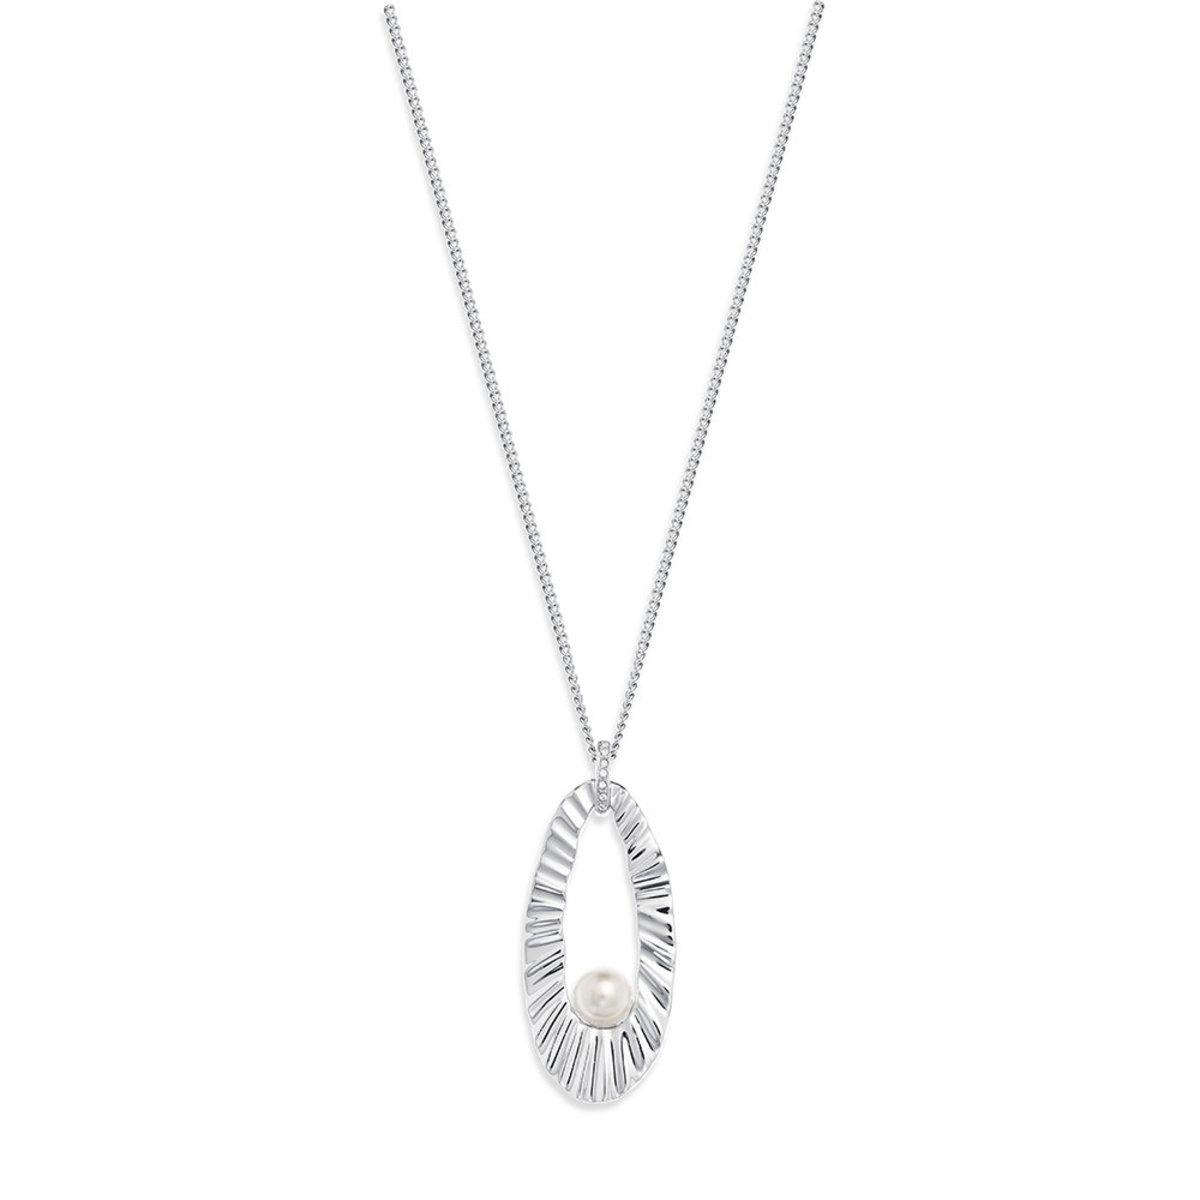 Glanz: platinum plating, Czech crystal pearl, Swarovski crystal necklace